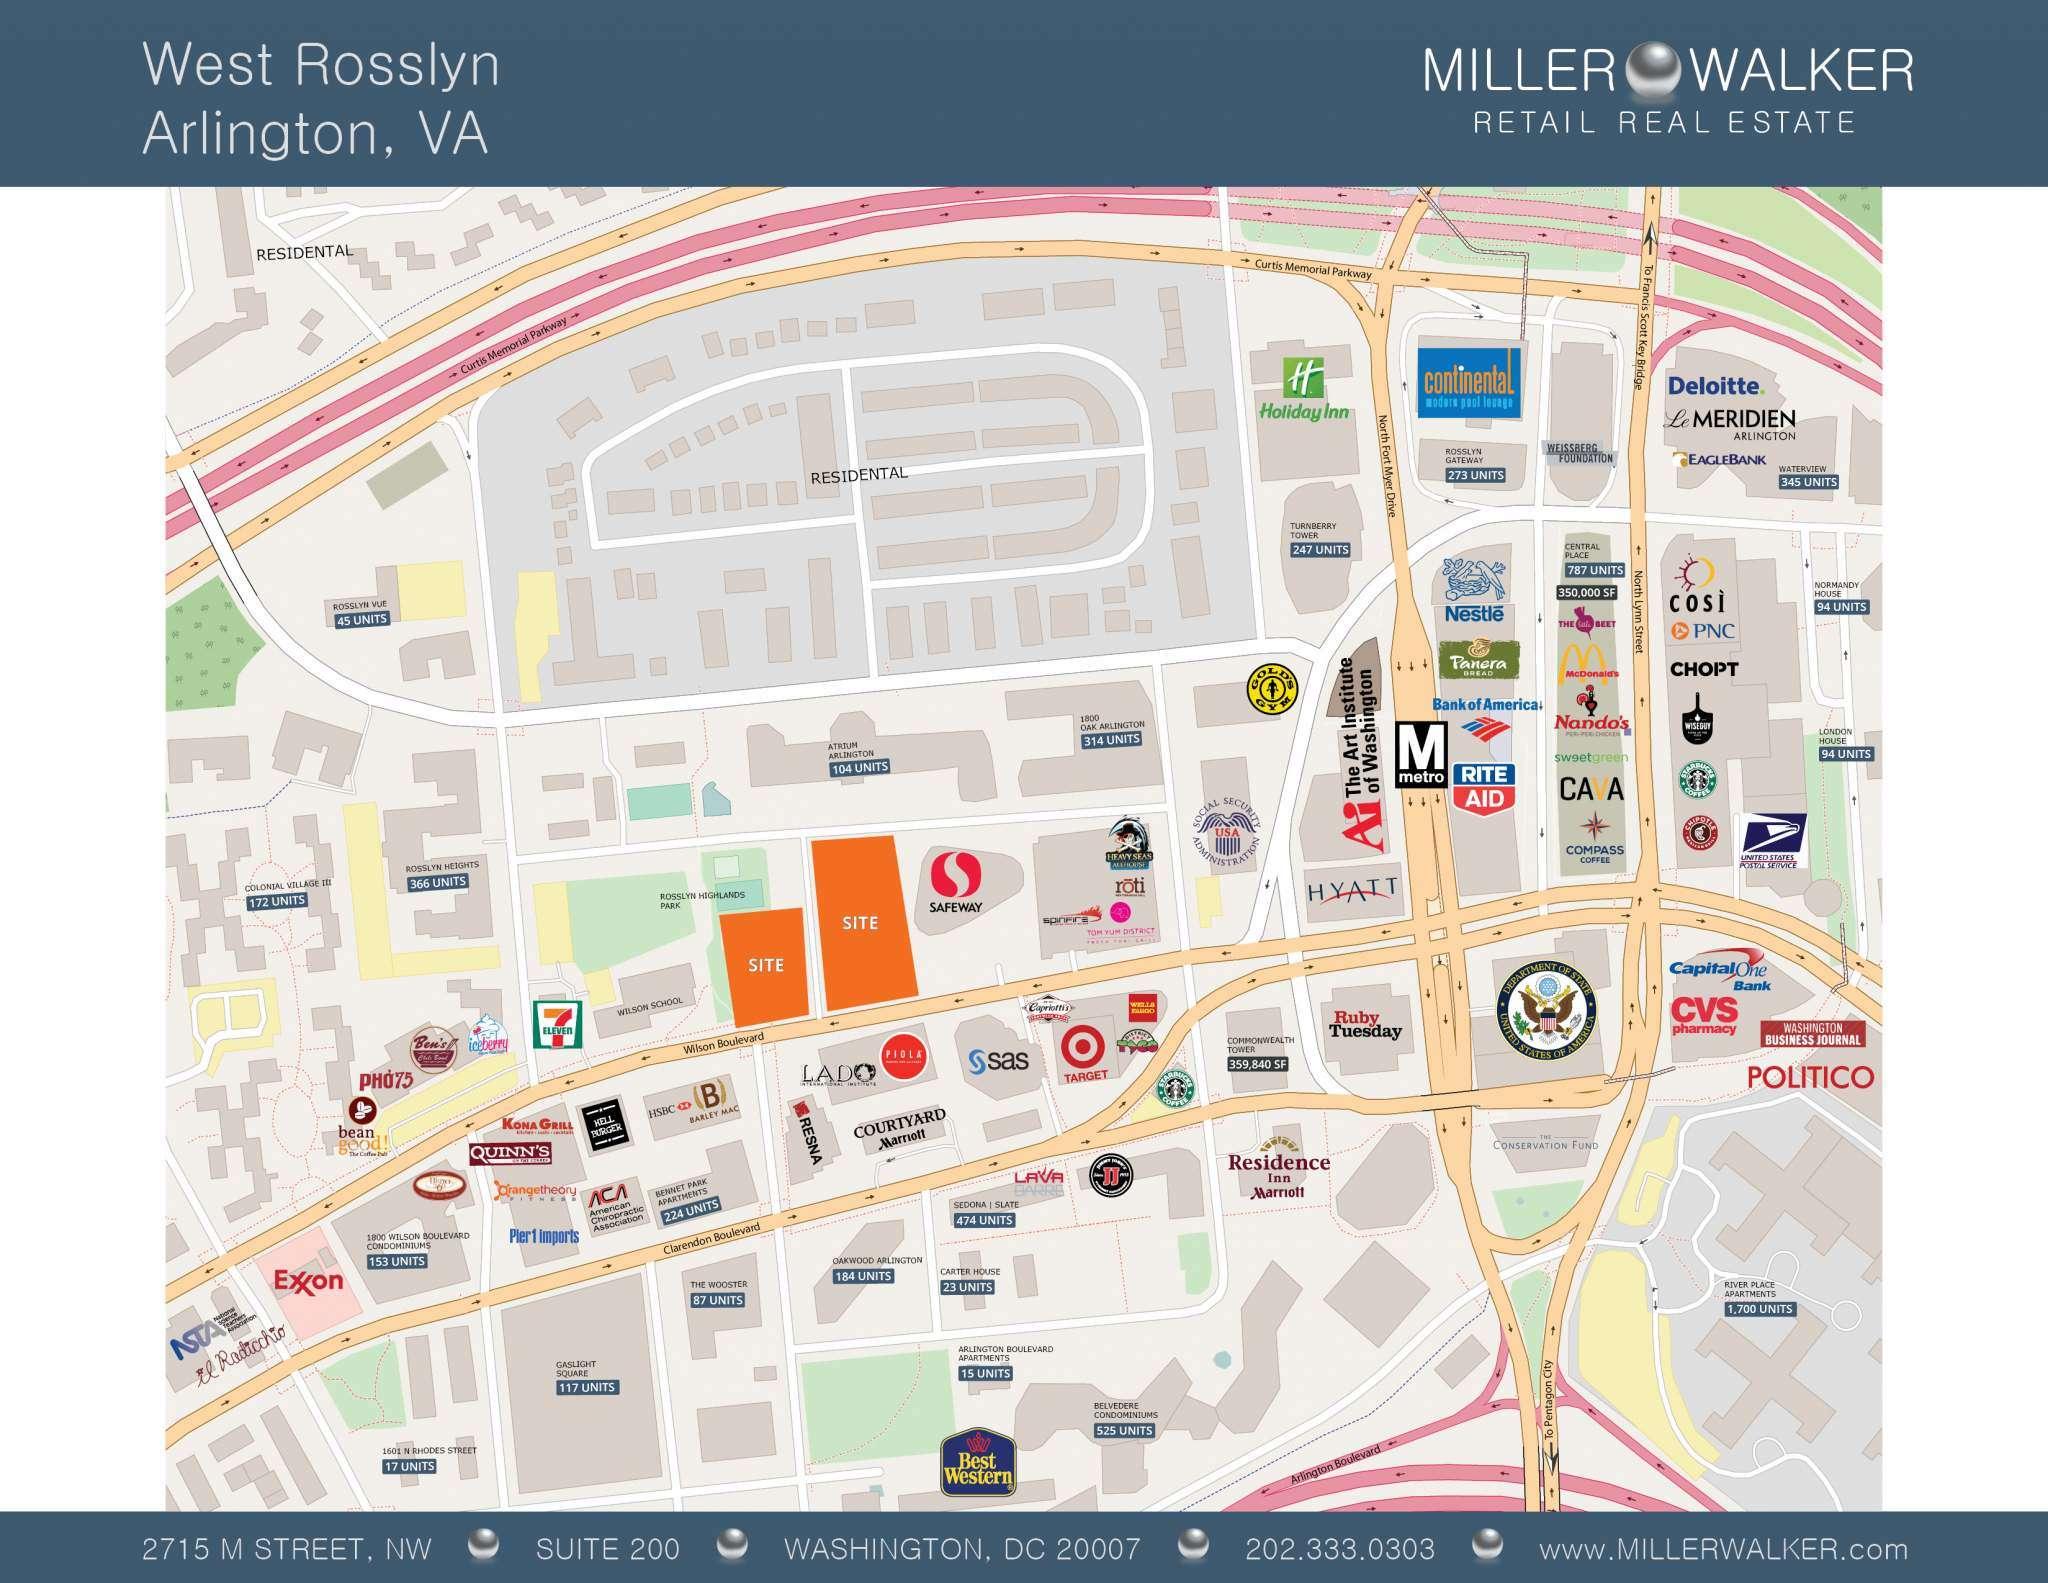 rosslyn-retail-map